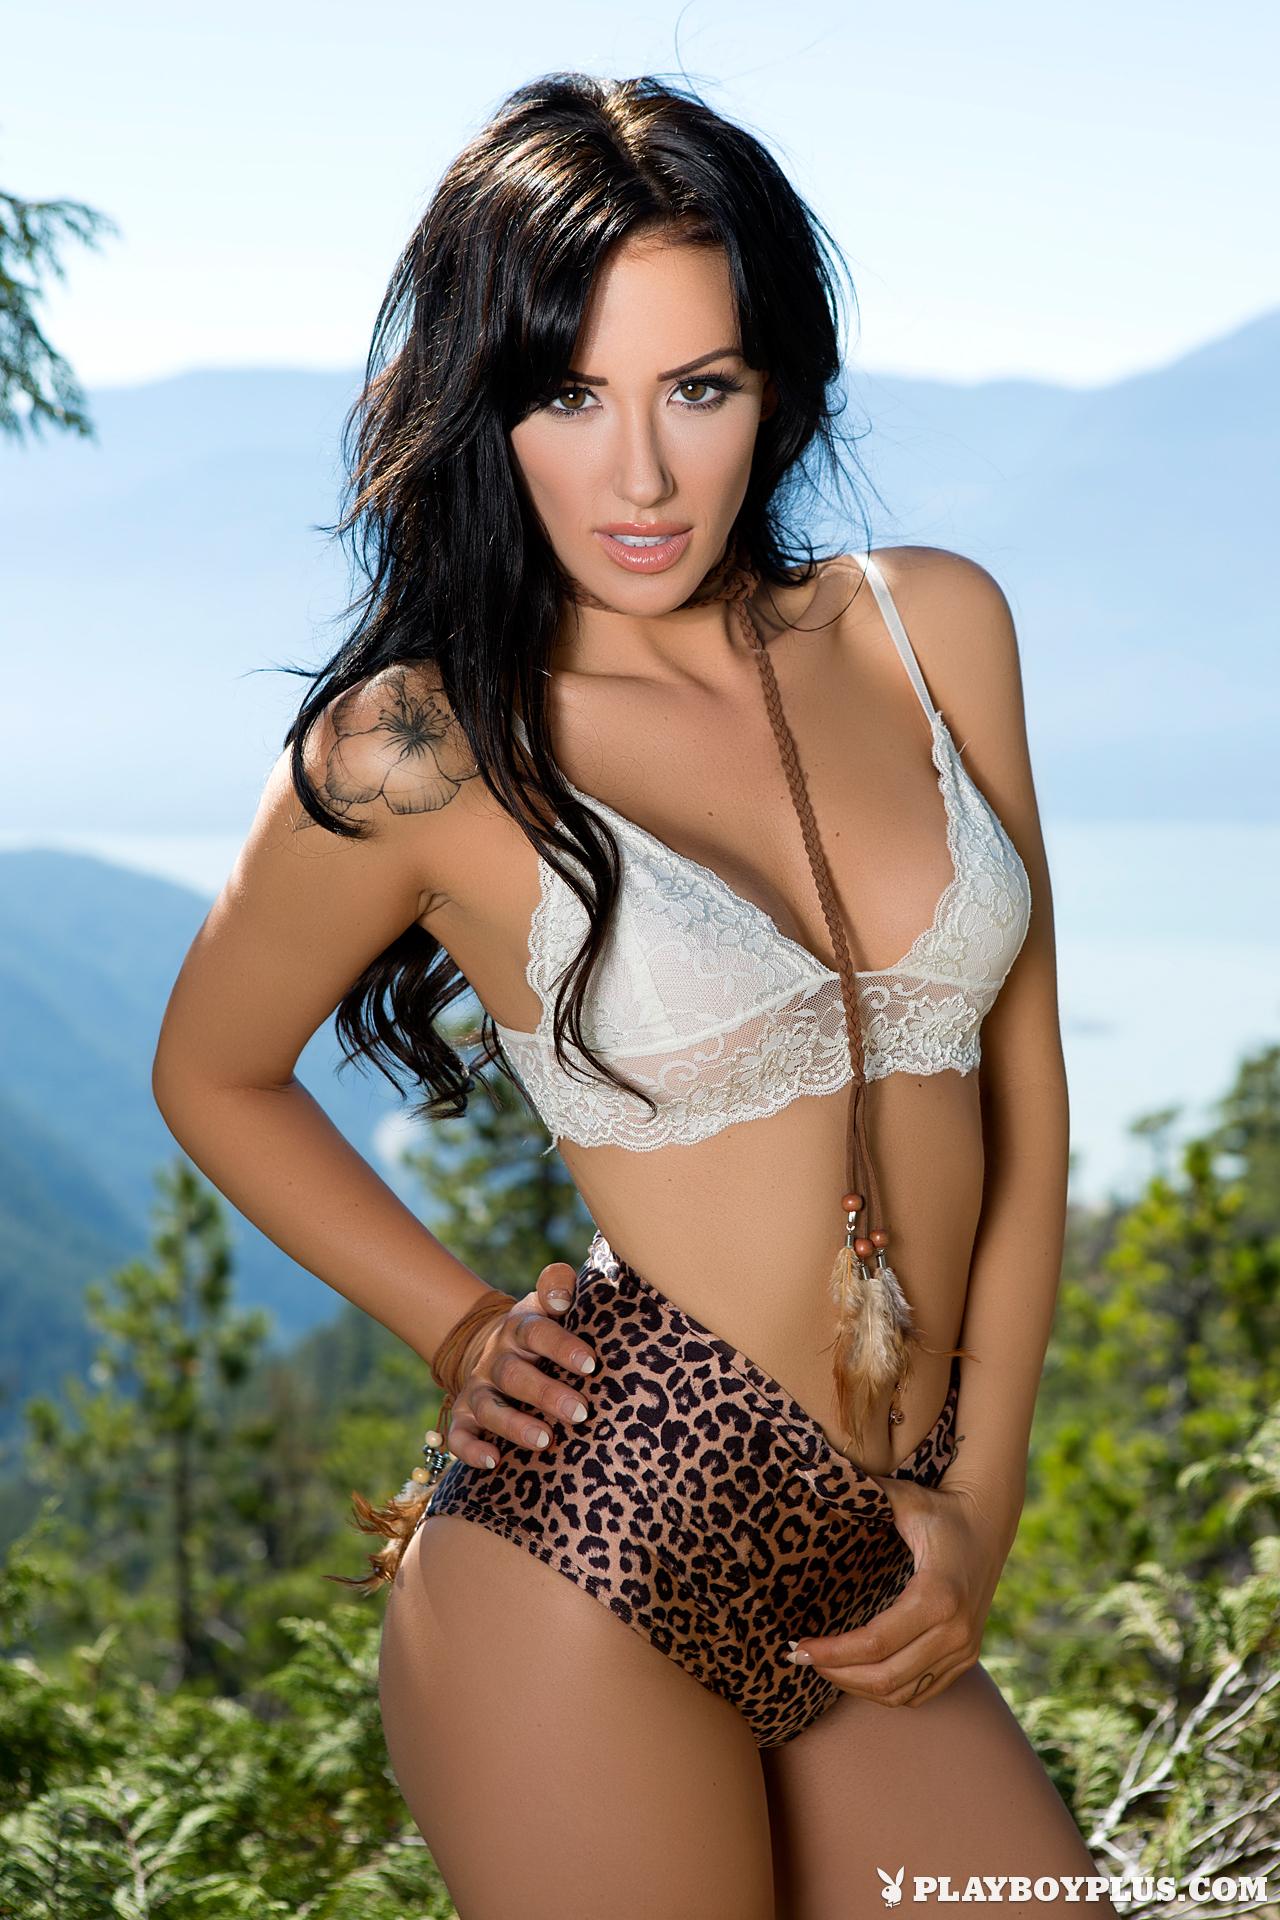 Alyssa Bennett in Wild Side - Centerfolds Blog